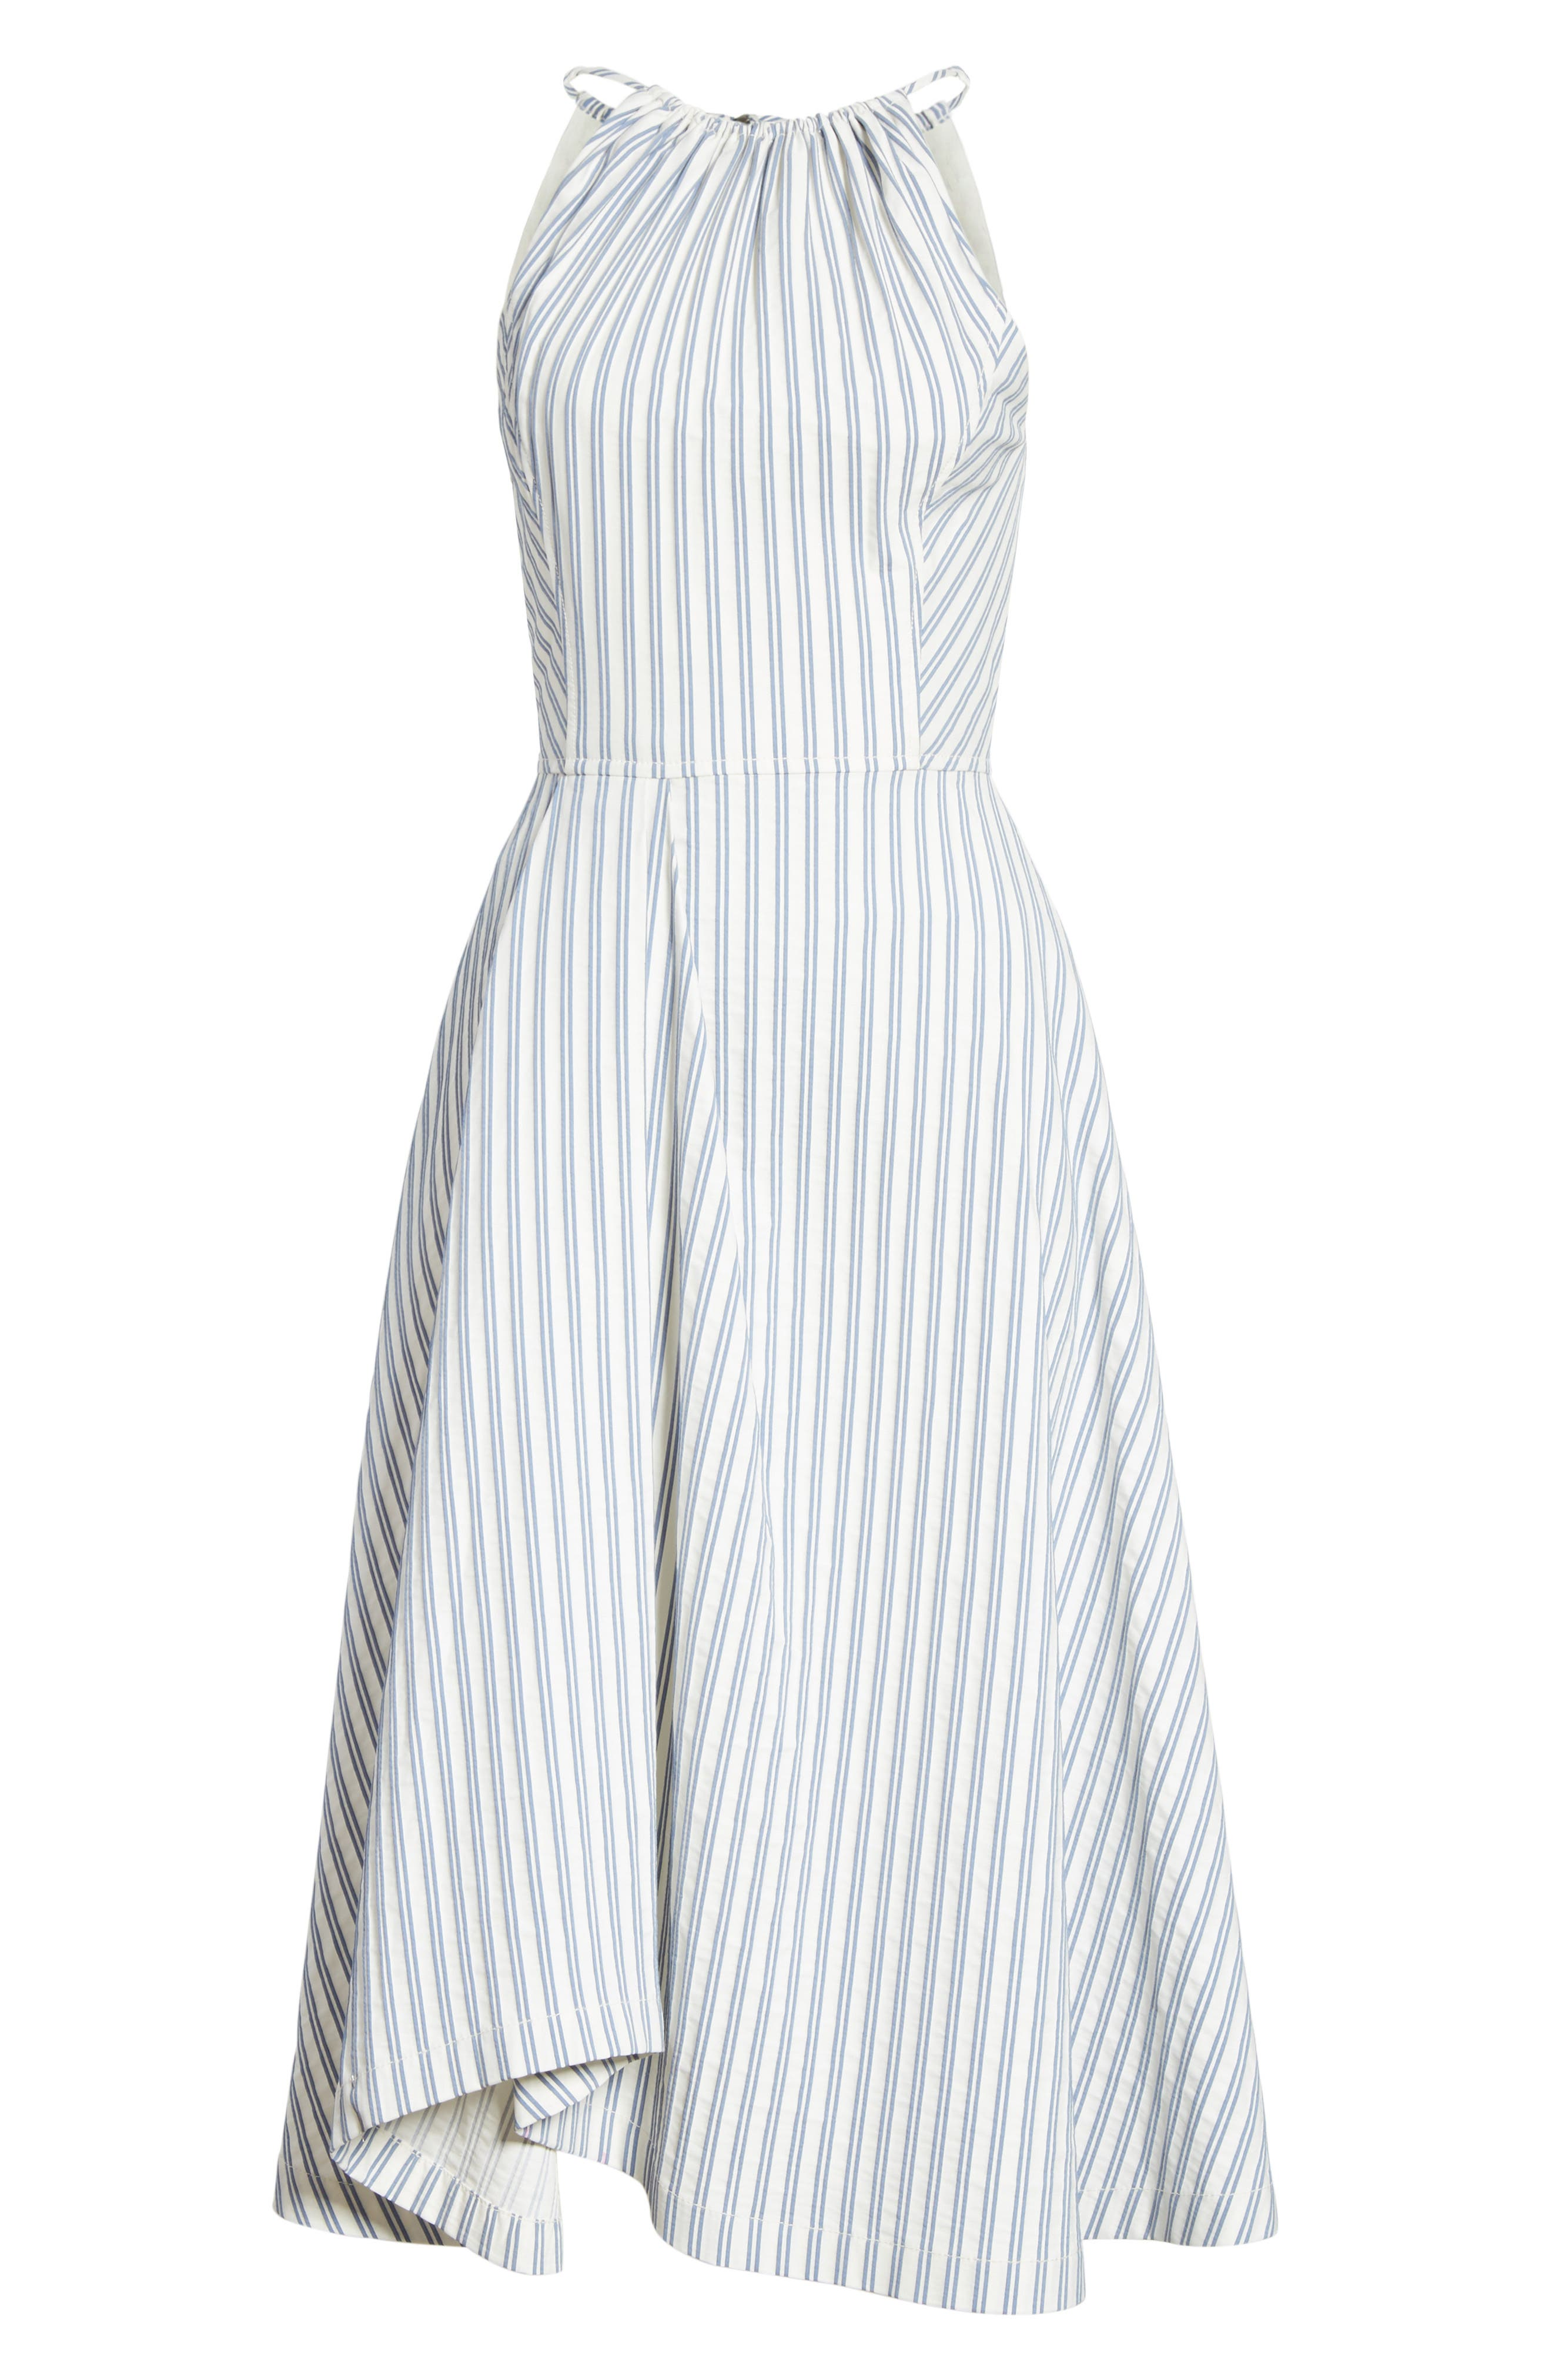 Stripe Shirting Apron Day Dress,                             Alternate thumbnail 6, color,                             453